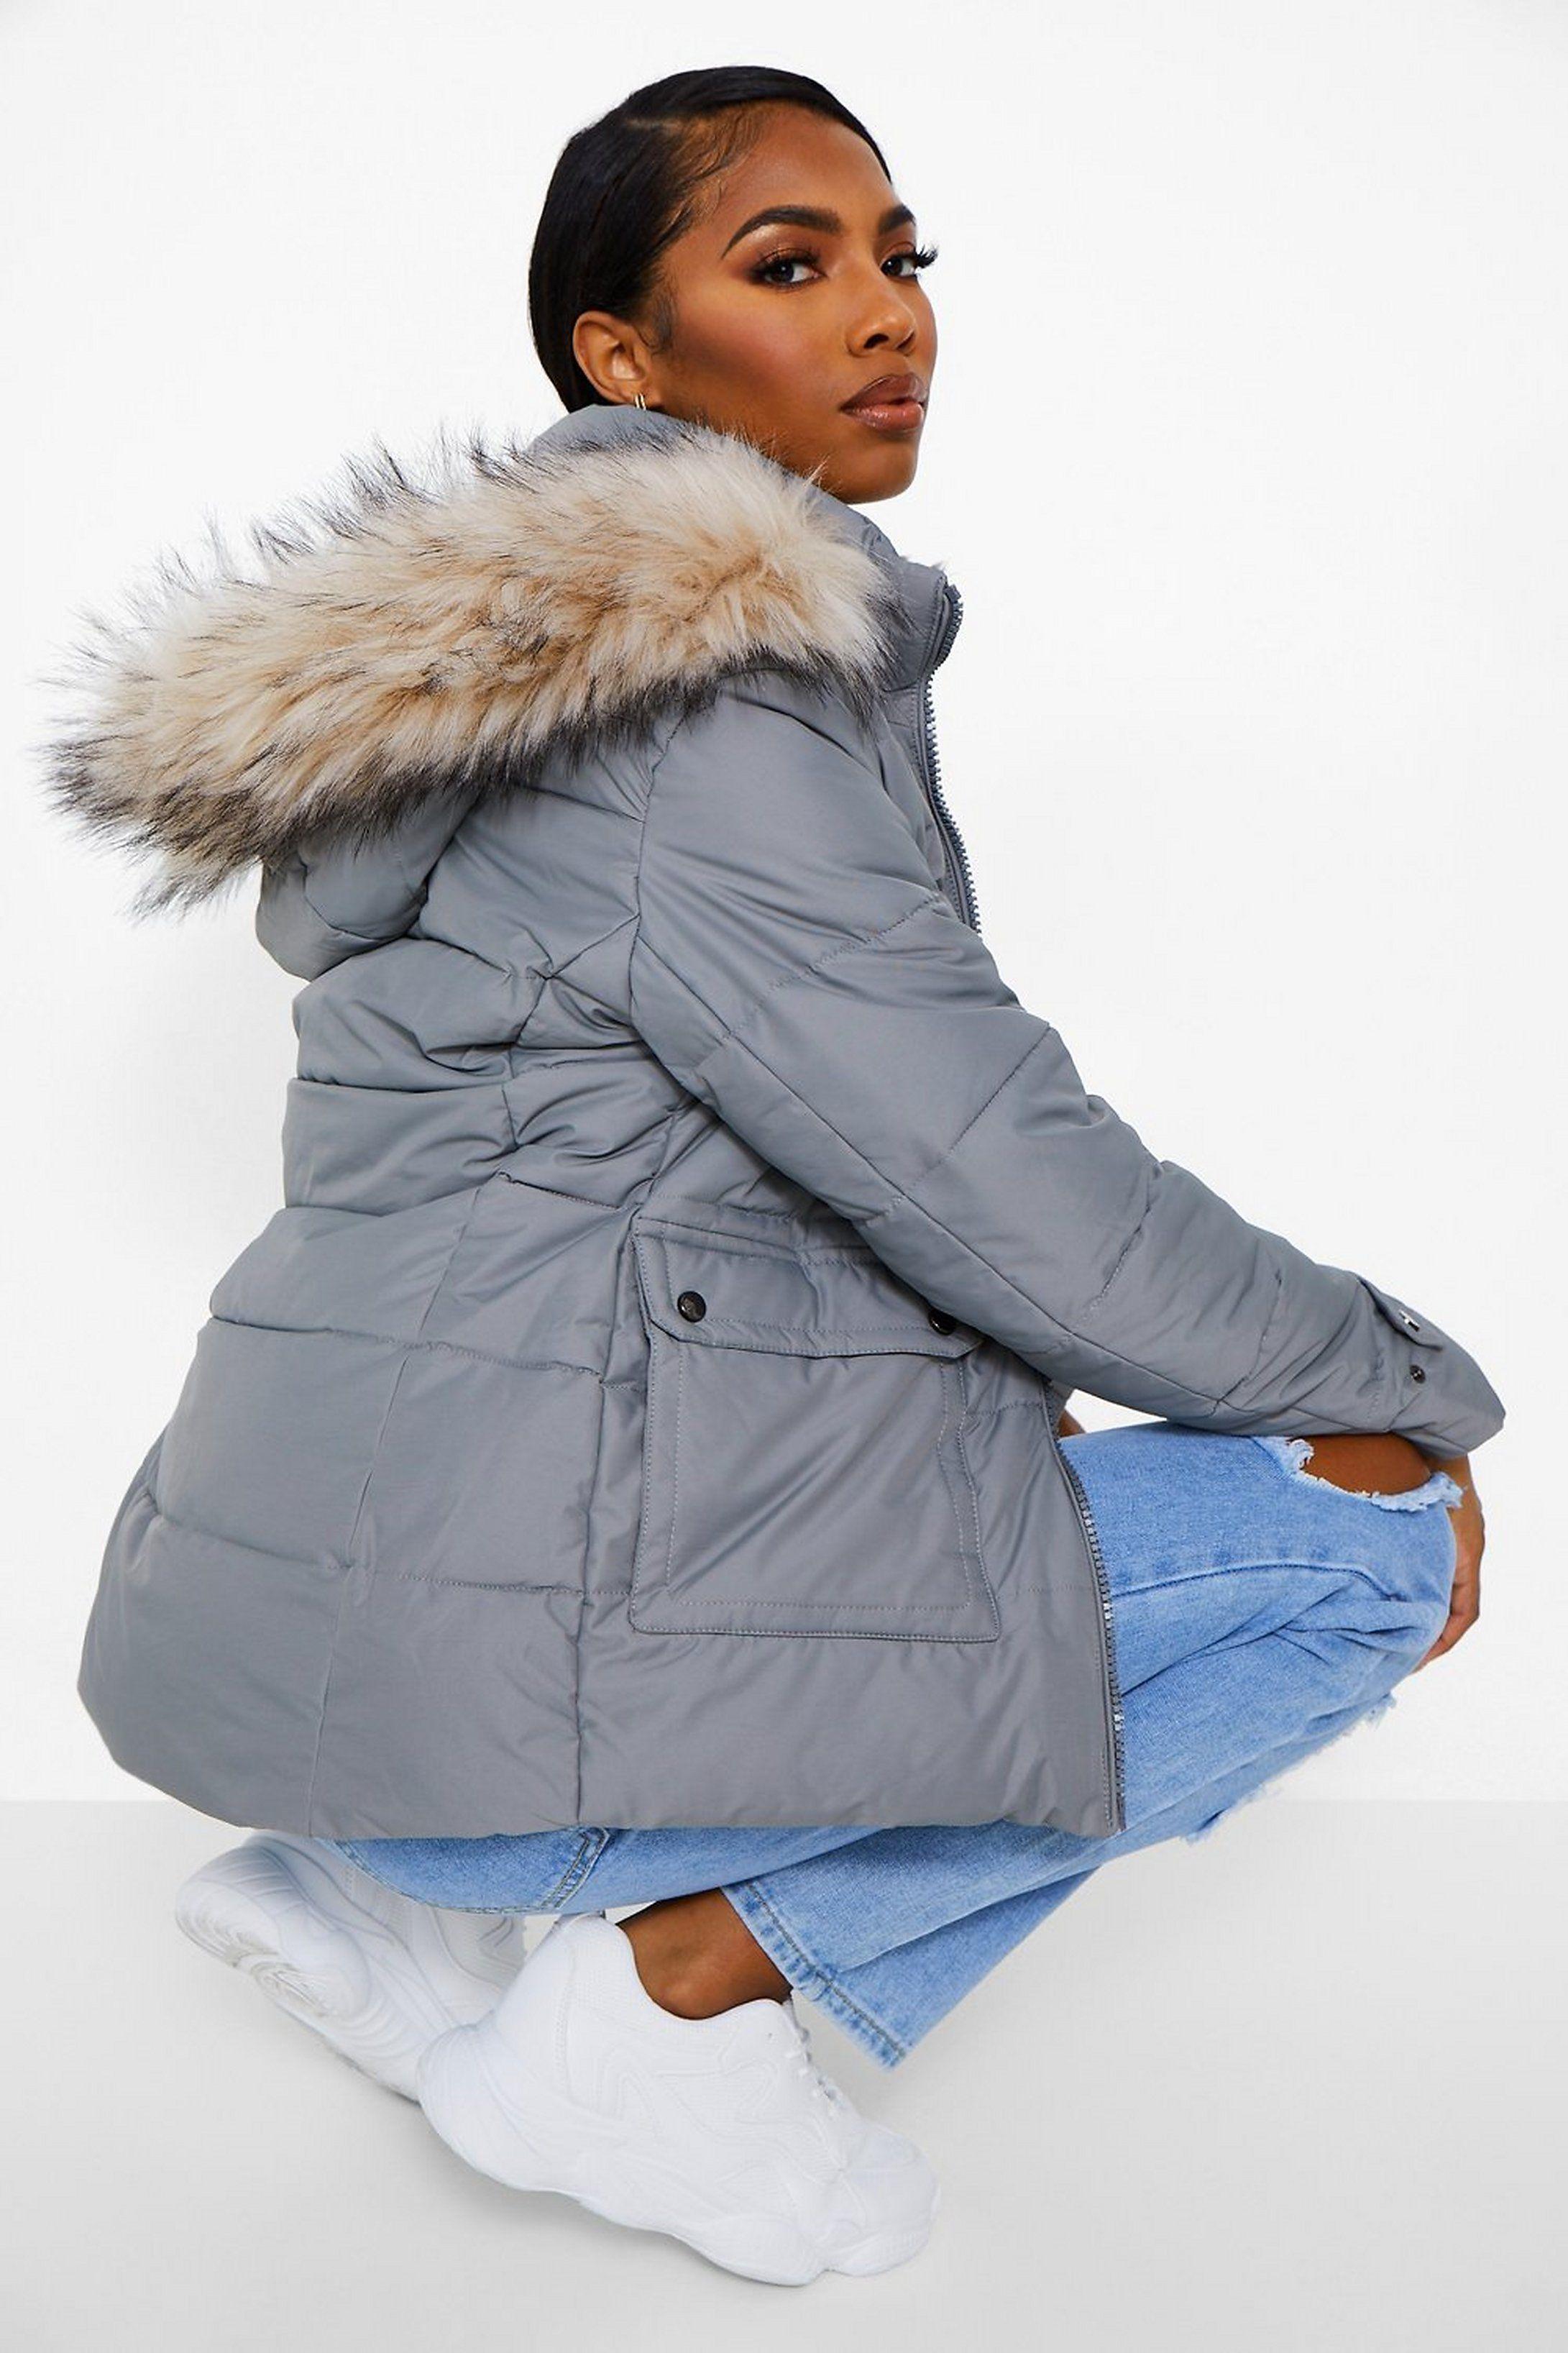 Faux Fur Lined Puffer Jacket Boohoo Faux Fur Puffer Jacket Puffer Jackets Jackets [ 3272 x 2181 Pixel ]